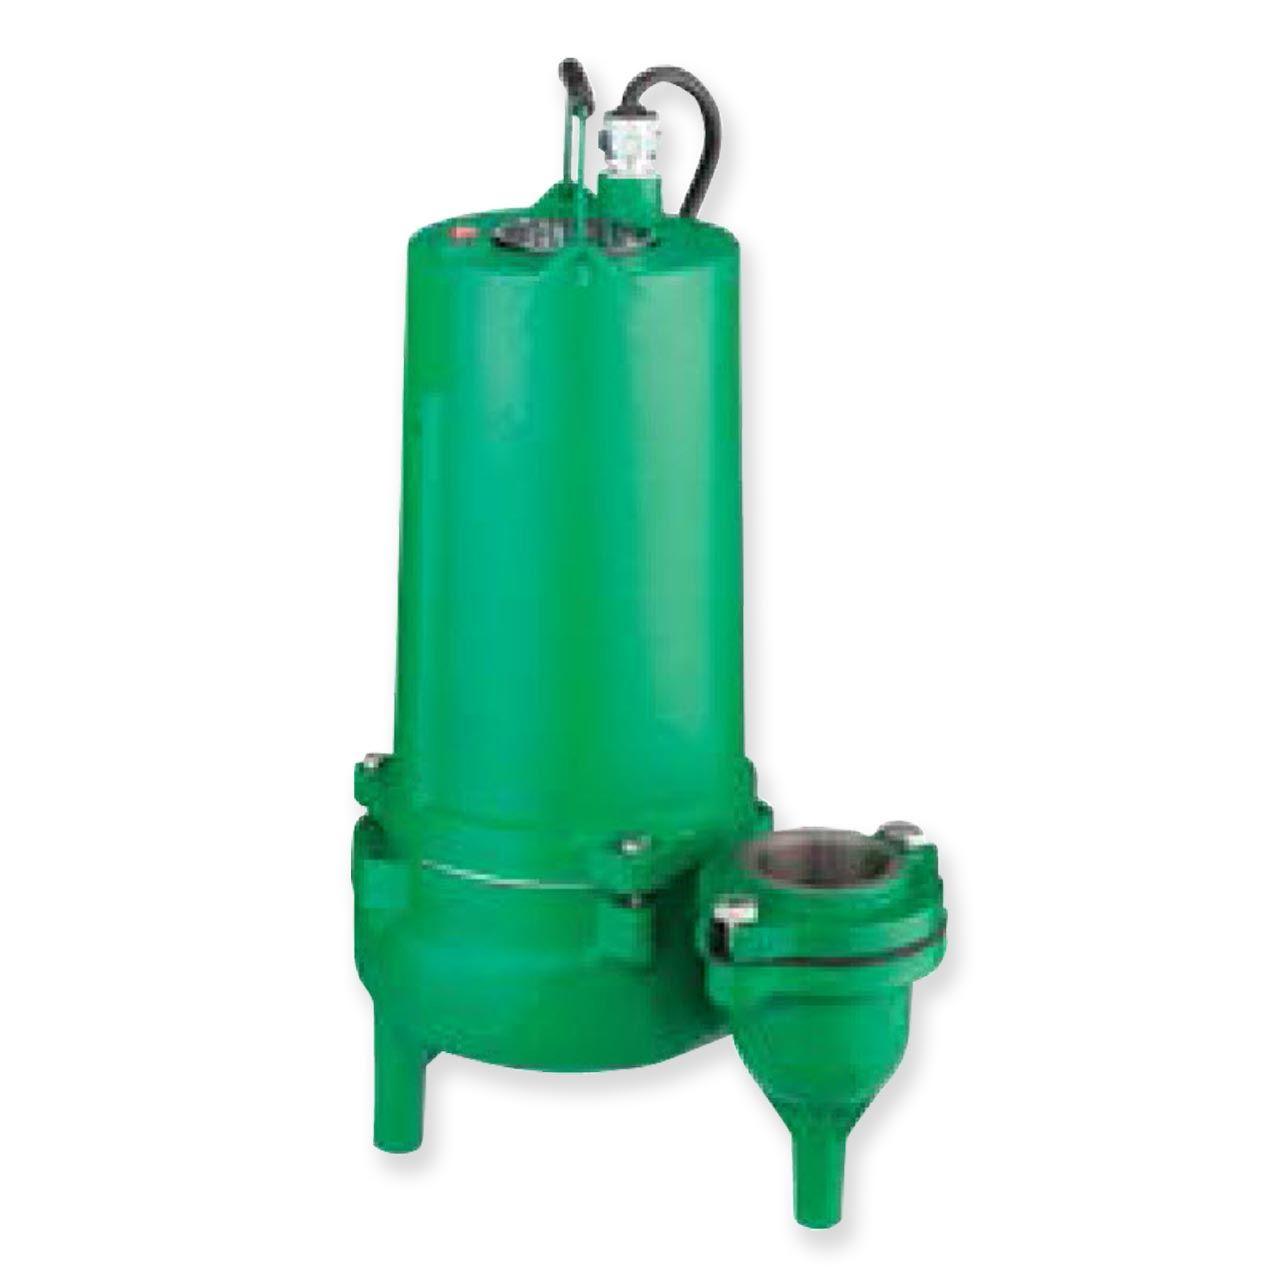 Myers Submersible Pump Wiring Diagram Libraries 33934 Wix Fuel Filter Mskhs200m2 Sewage 2 Hp 230v 1ph